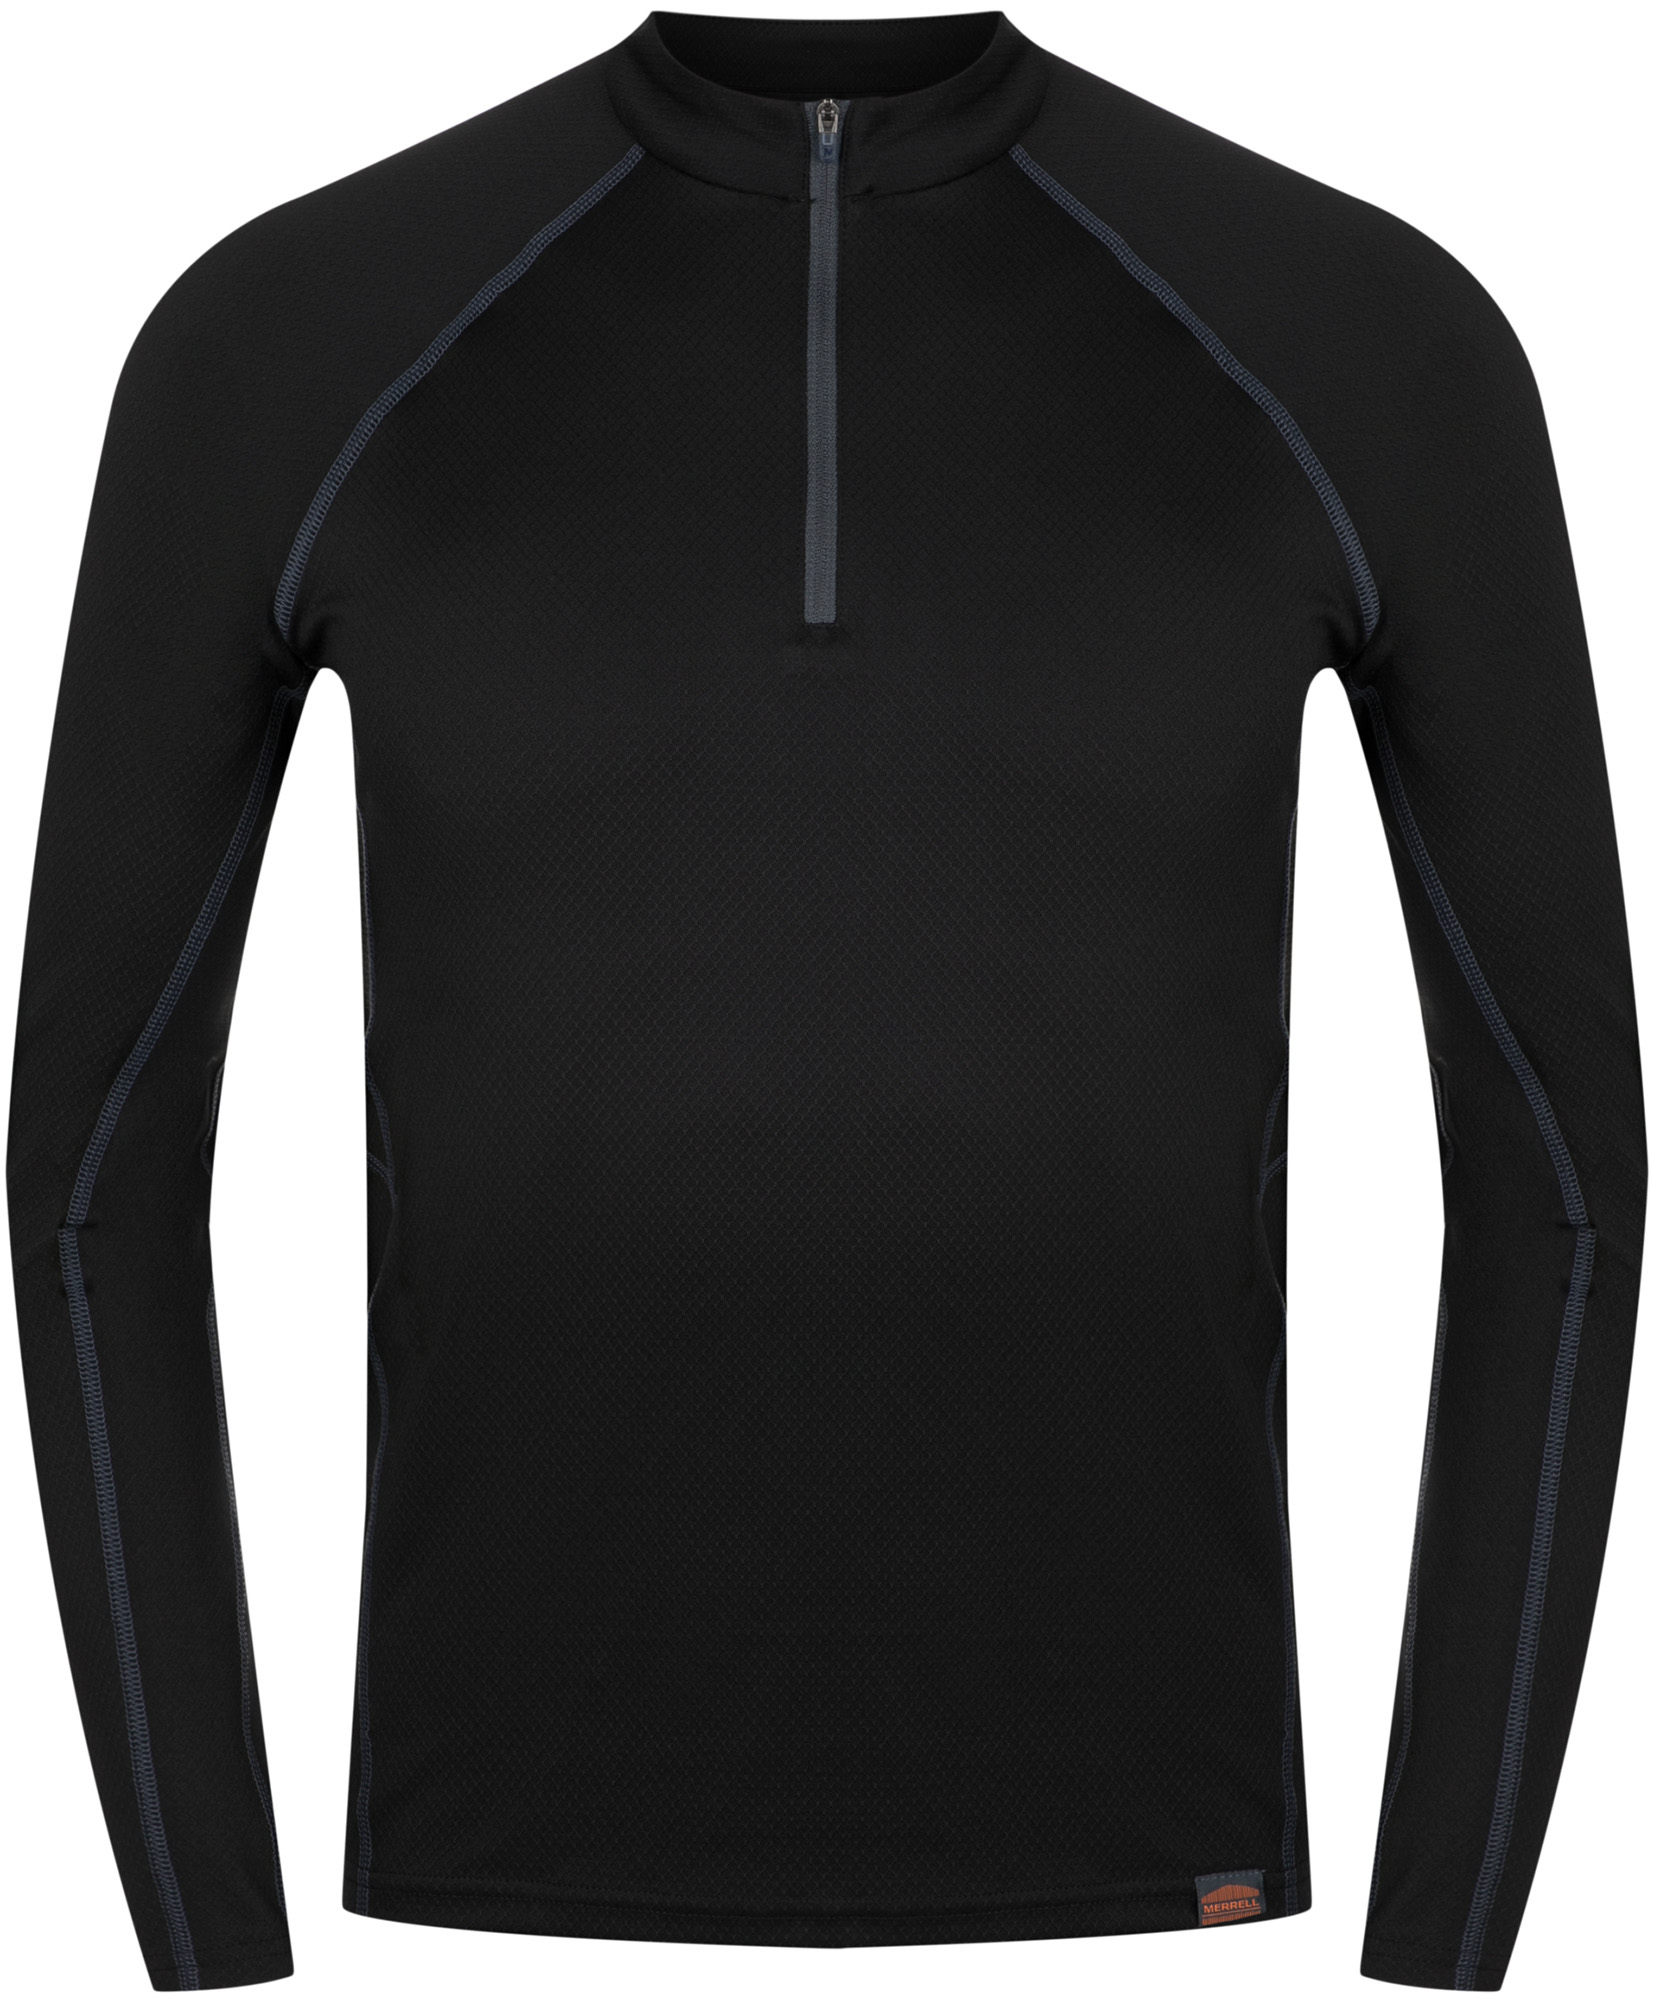 лонгслив мужской regatta karter цвет серый rmt171 038 размер l 52 54 Merrell Лонгслив мужской Merrell, размер 52